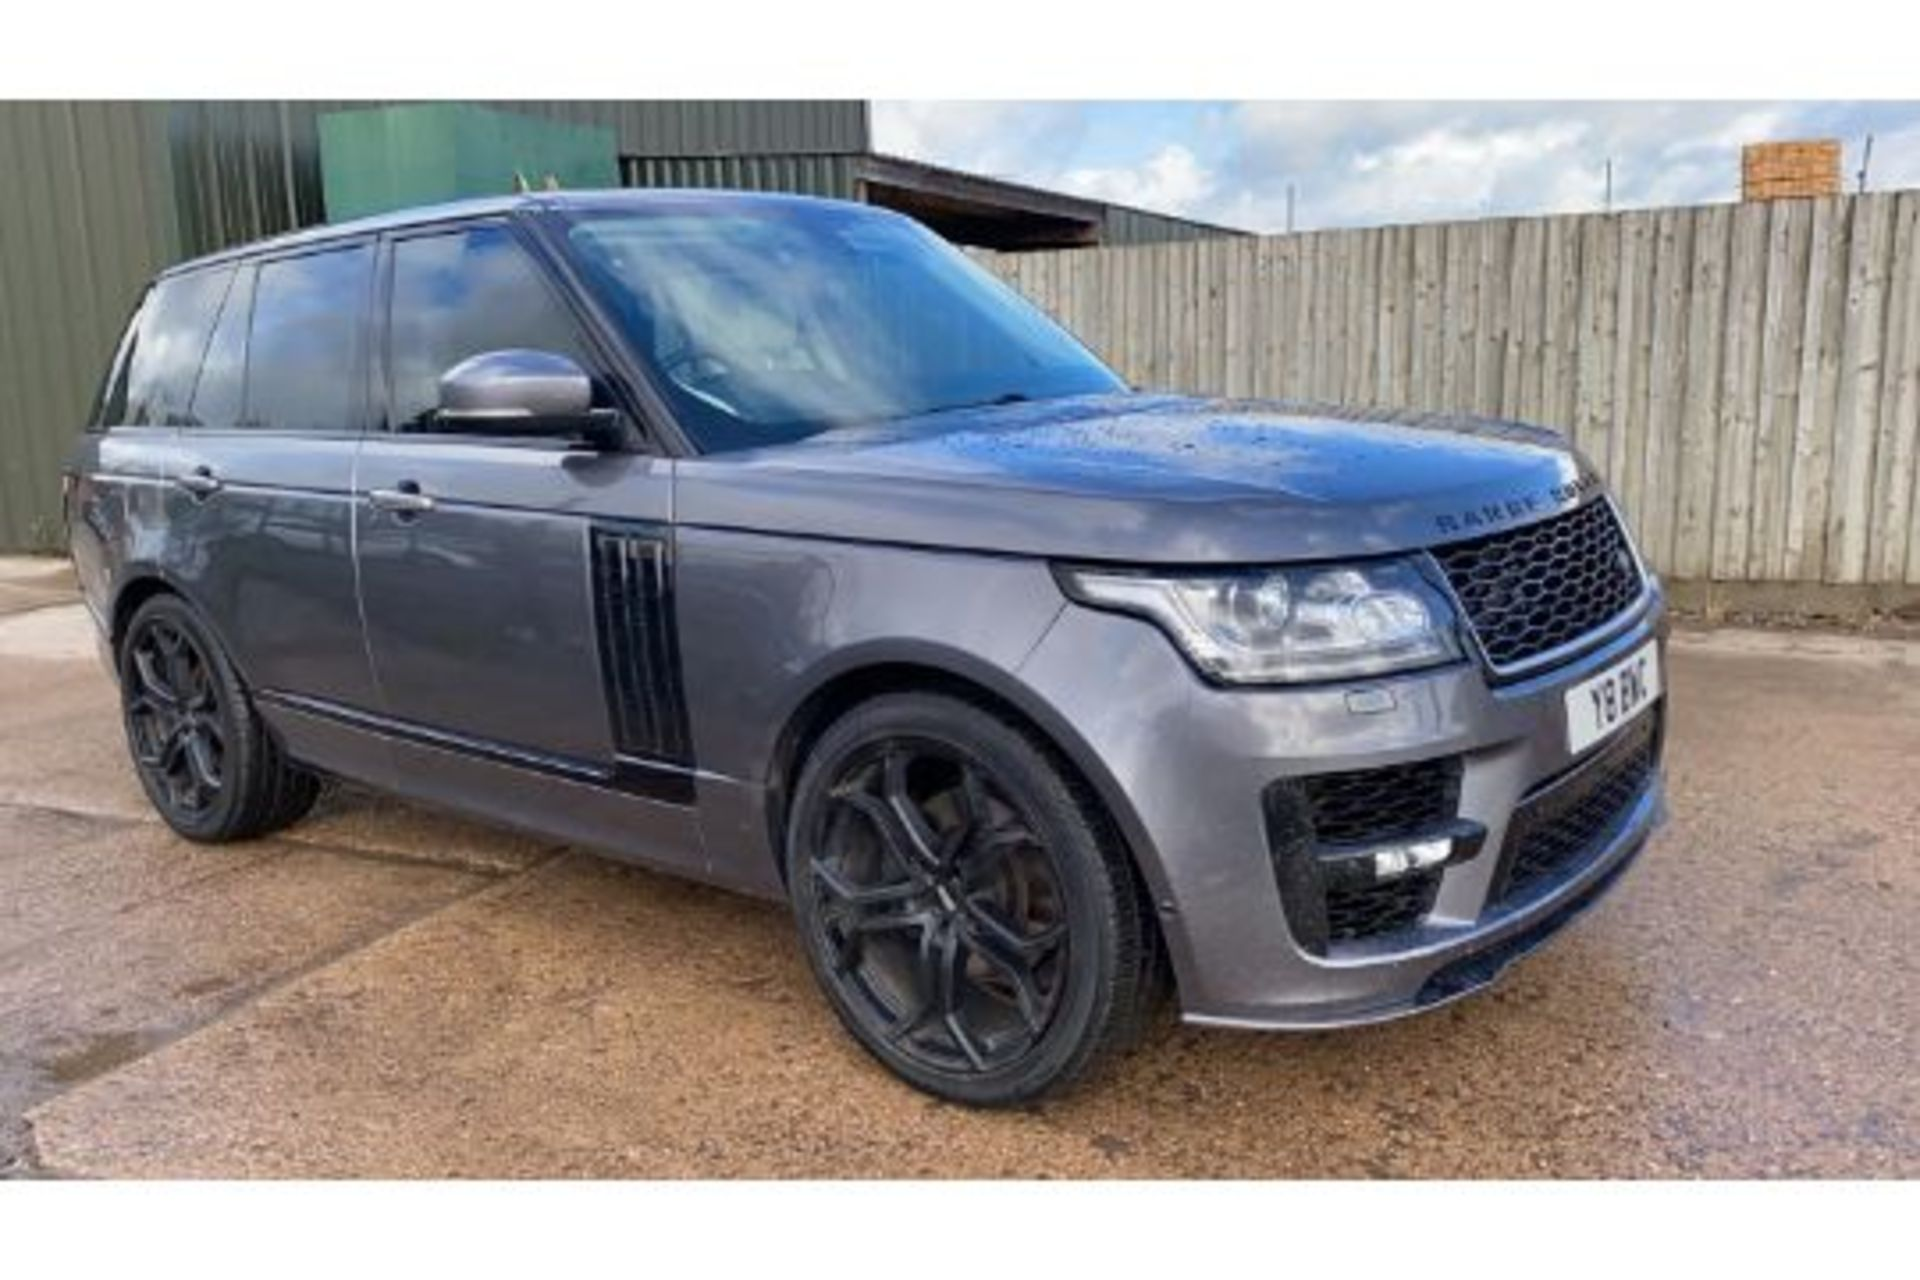 Range Rover Vogue 3.0 TDV6 SE Auto - Black Pack - NEW SHAPE - FULLY LOADED - Pan Roof - Image 8 of 30